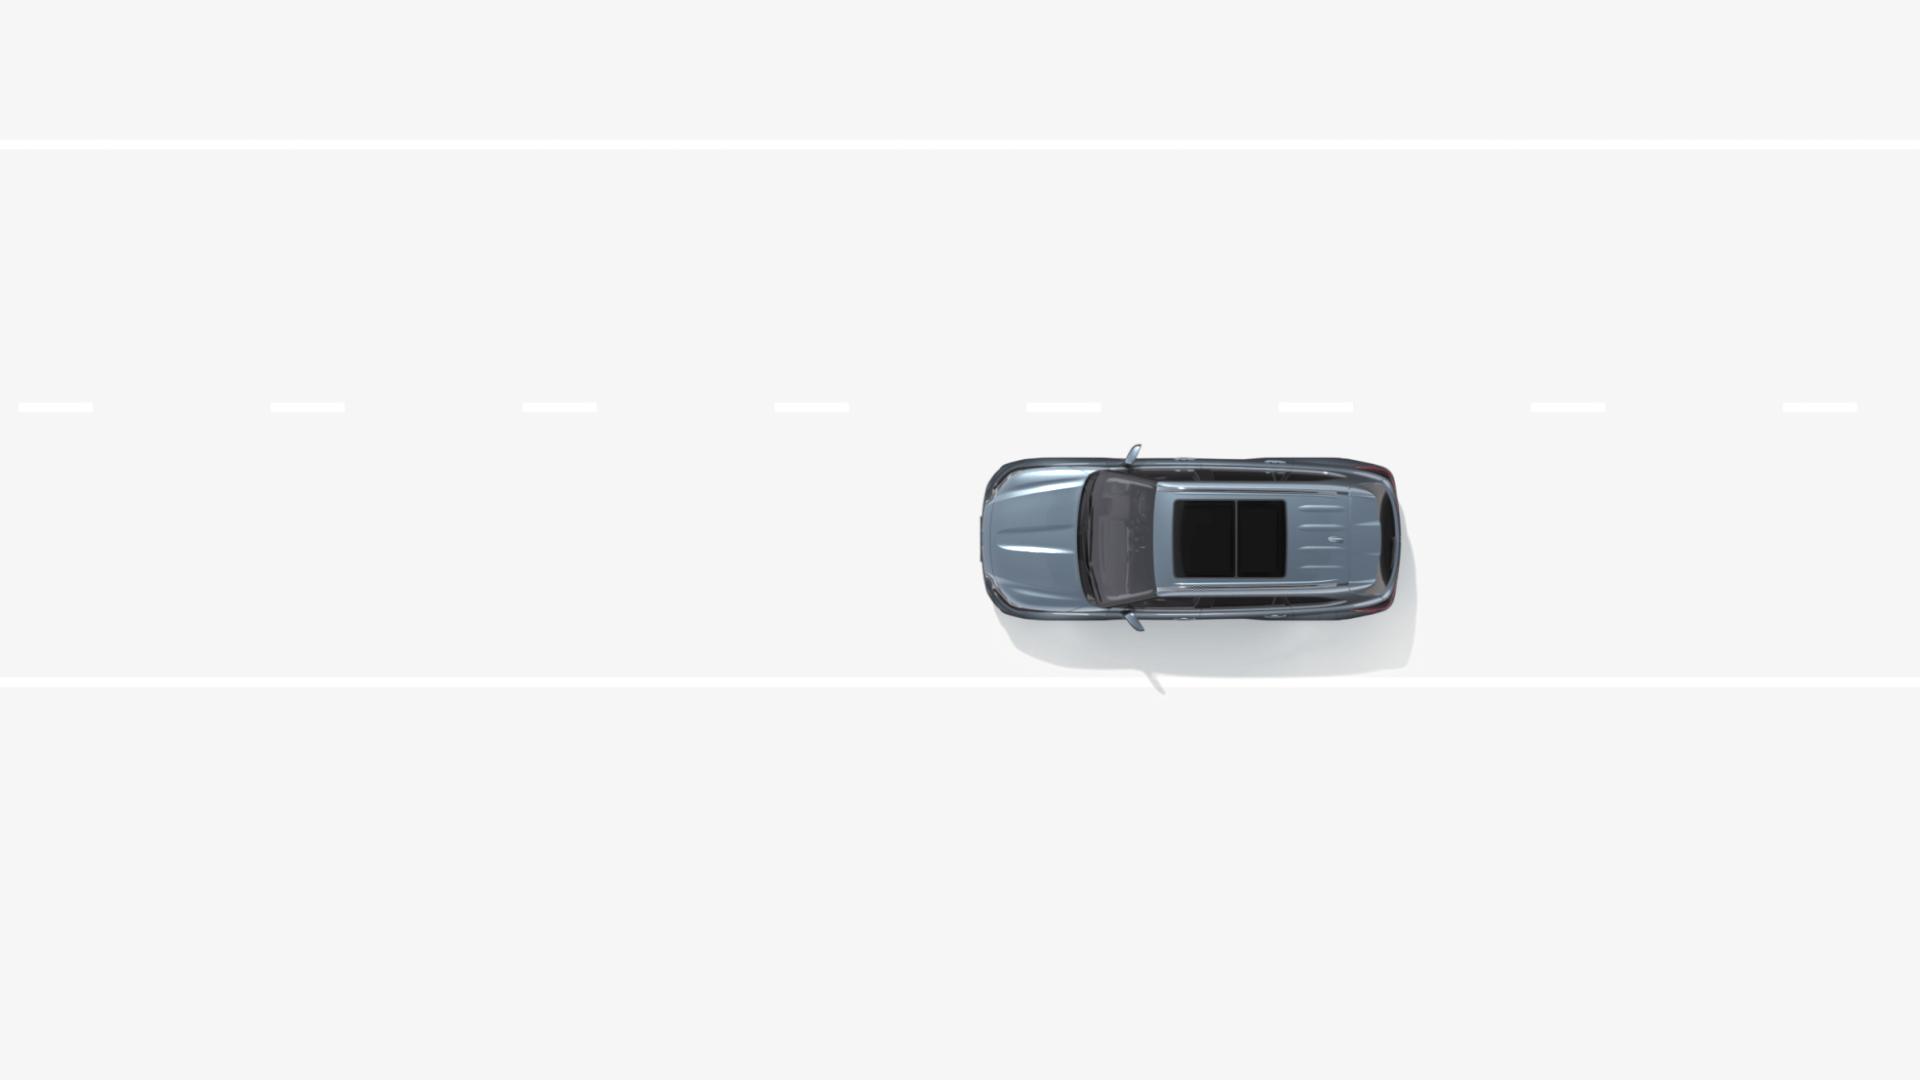 Toyota Kluger Safety